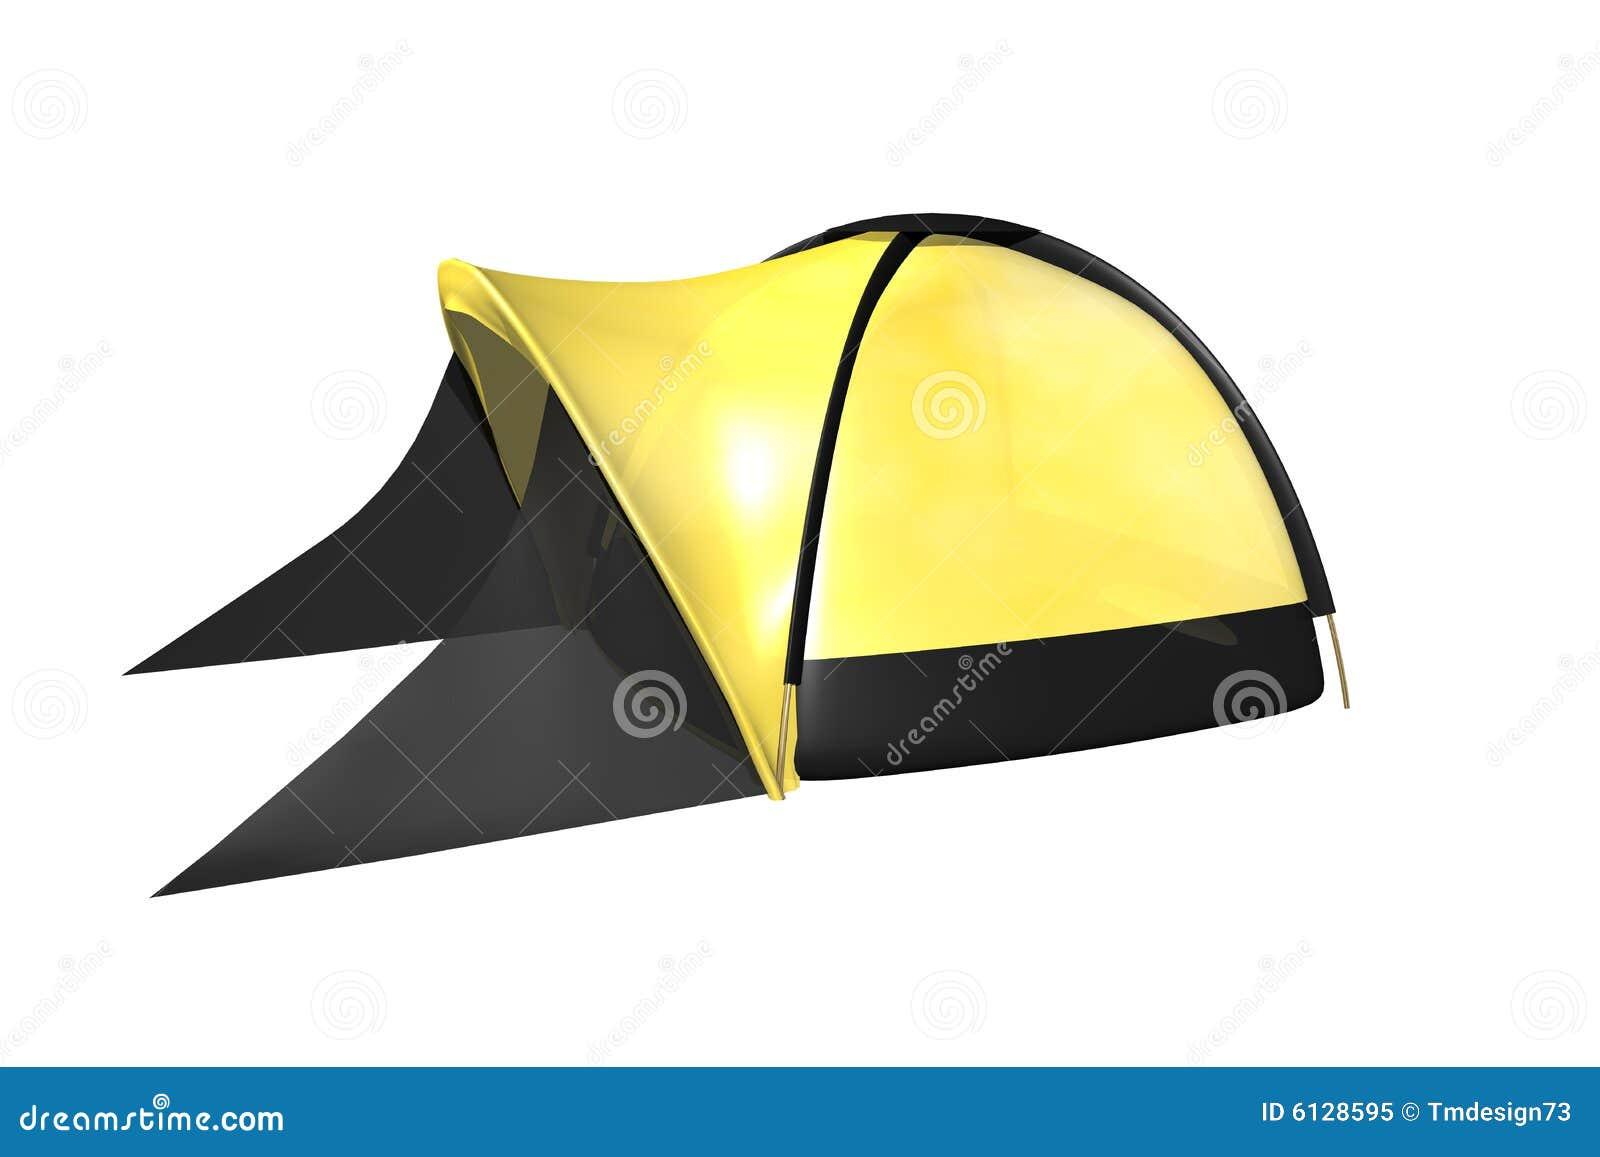 Tent Isolated On White Background Stock Illustration